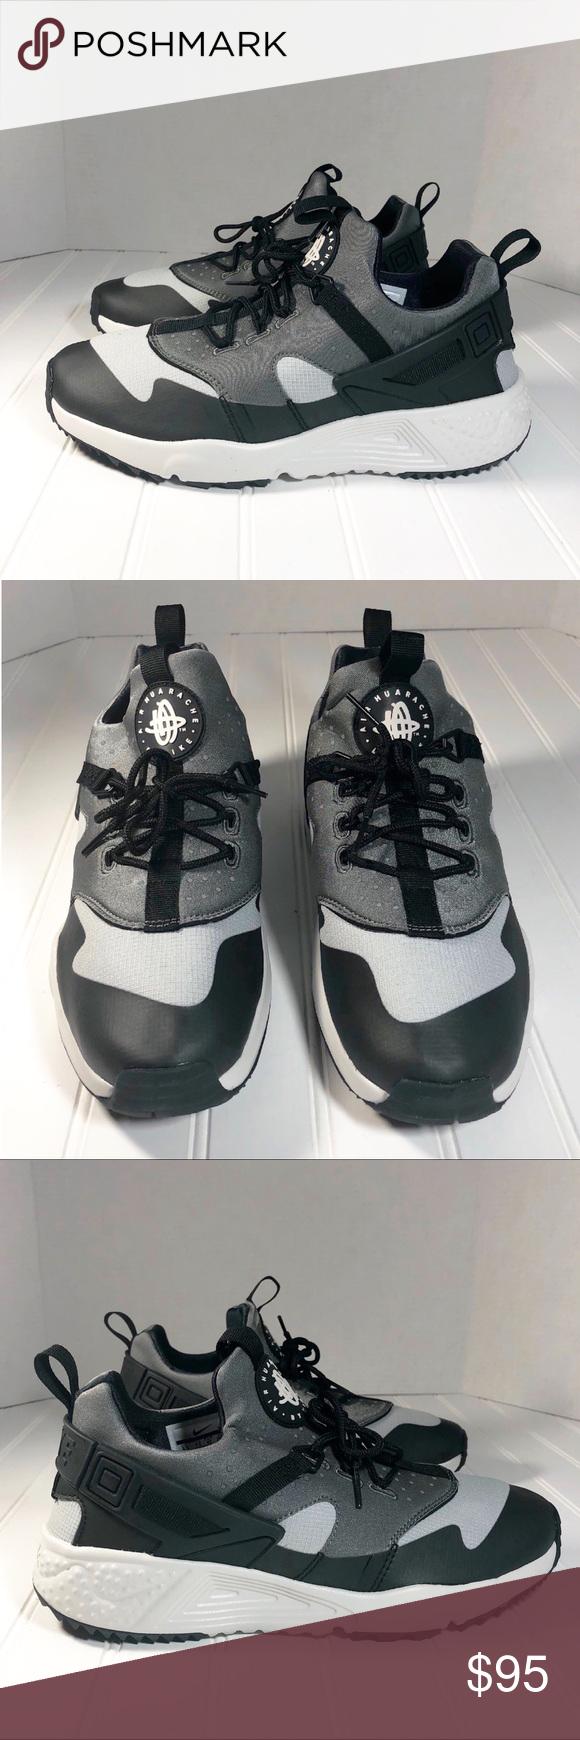 buy online 8ece2 e24b0 Nike Huarache Utility Gray 806807-003 Size 8.5 New without box Nike  Huarache Utility Base Gray Style ID  806807-003 Brand  Nike Color  Silver  Black White ...